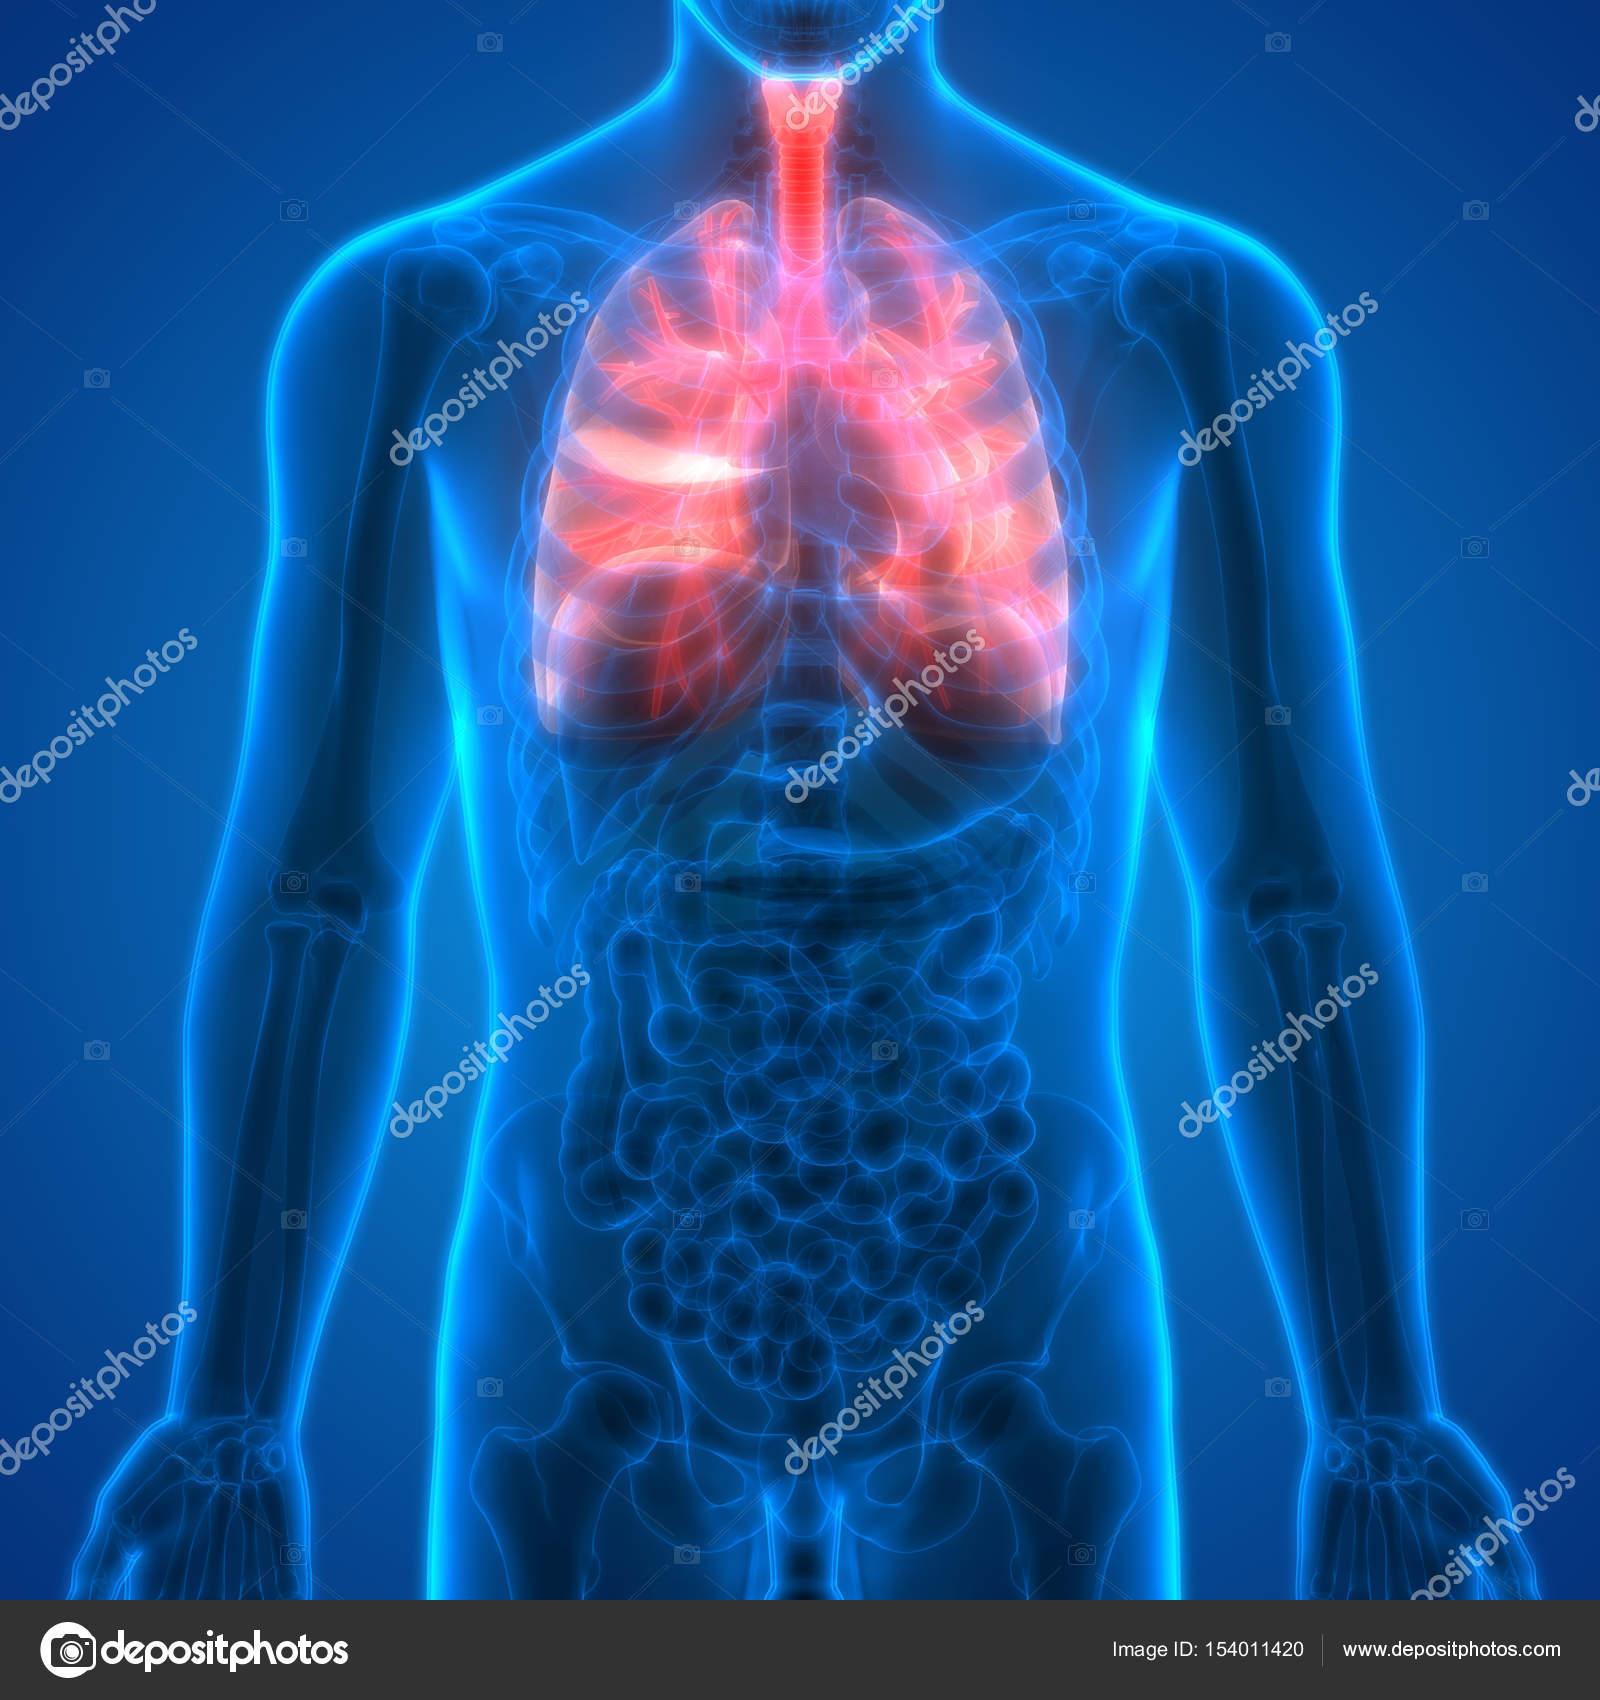 Human body organs lungs anatomy stock photo magicmine 154011420 human body organs lungs anatomy fotografia de stock ccuart Choice Image